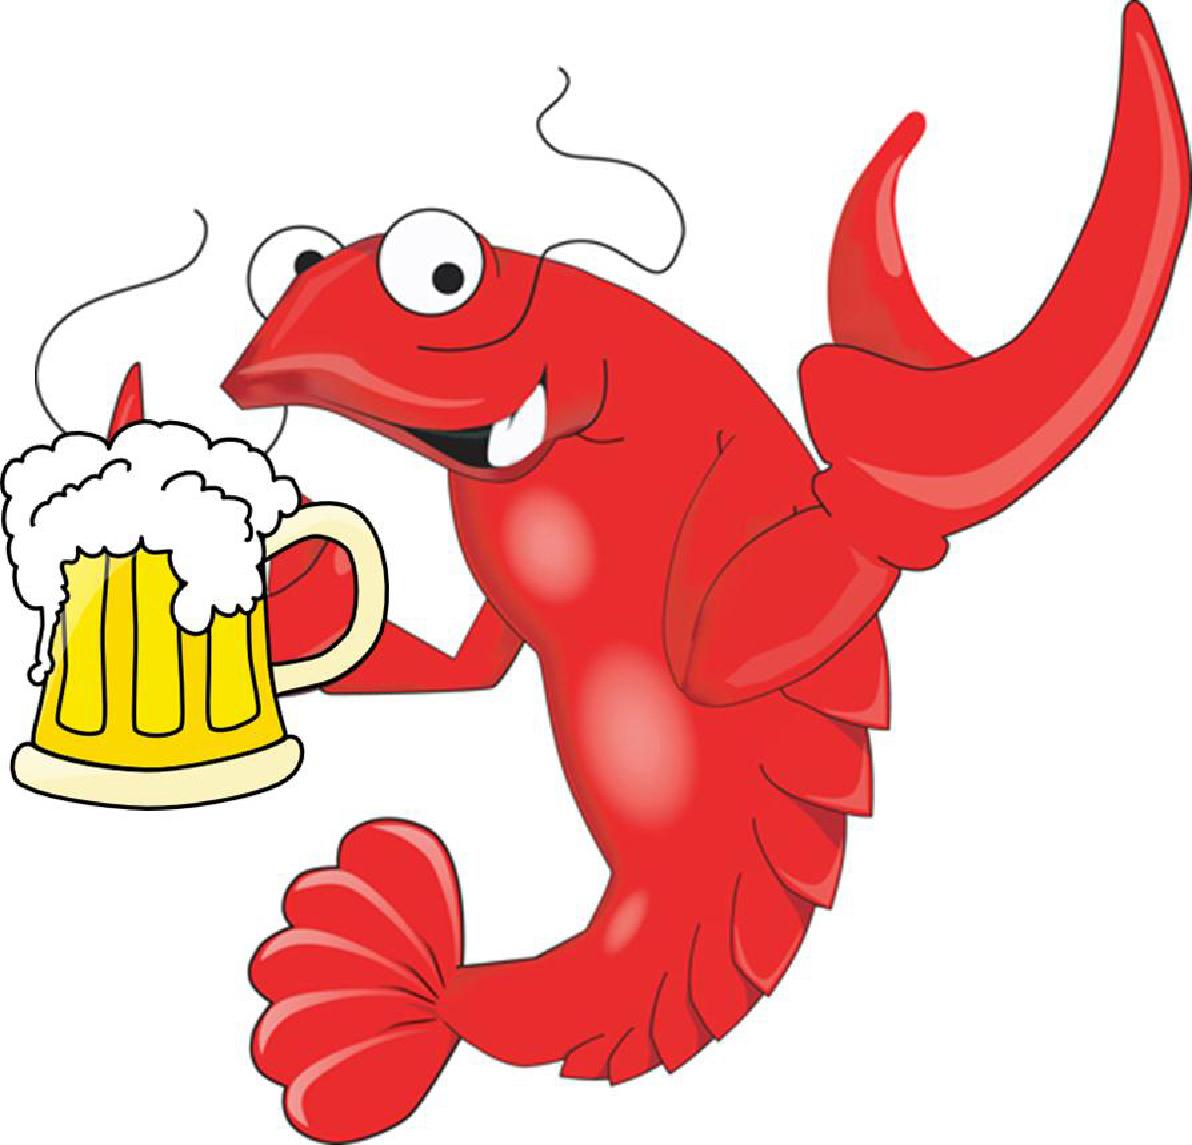 Crawfish clipart Crawfish Clipart Crawfish Logo Clipart